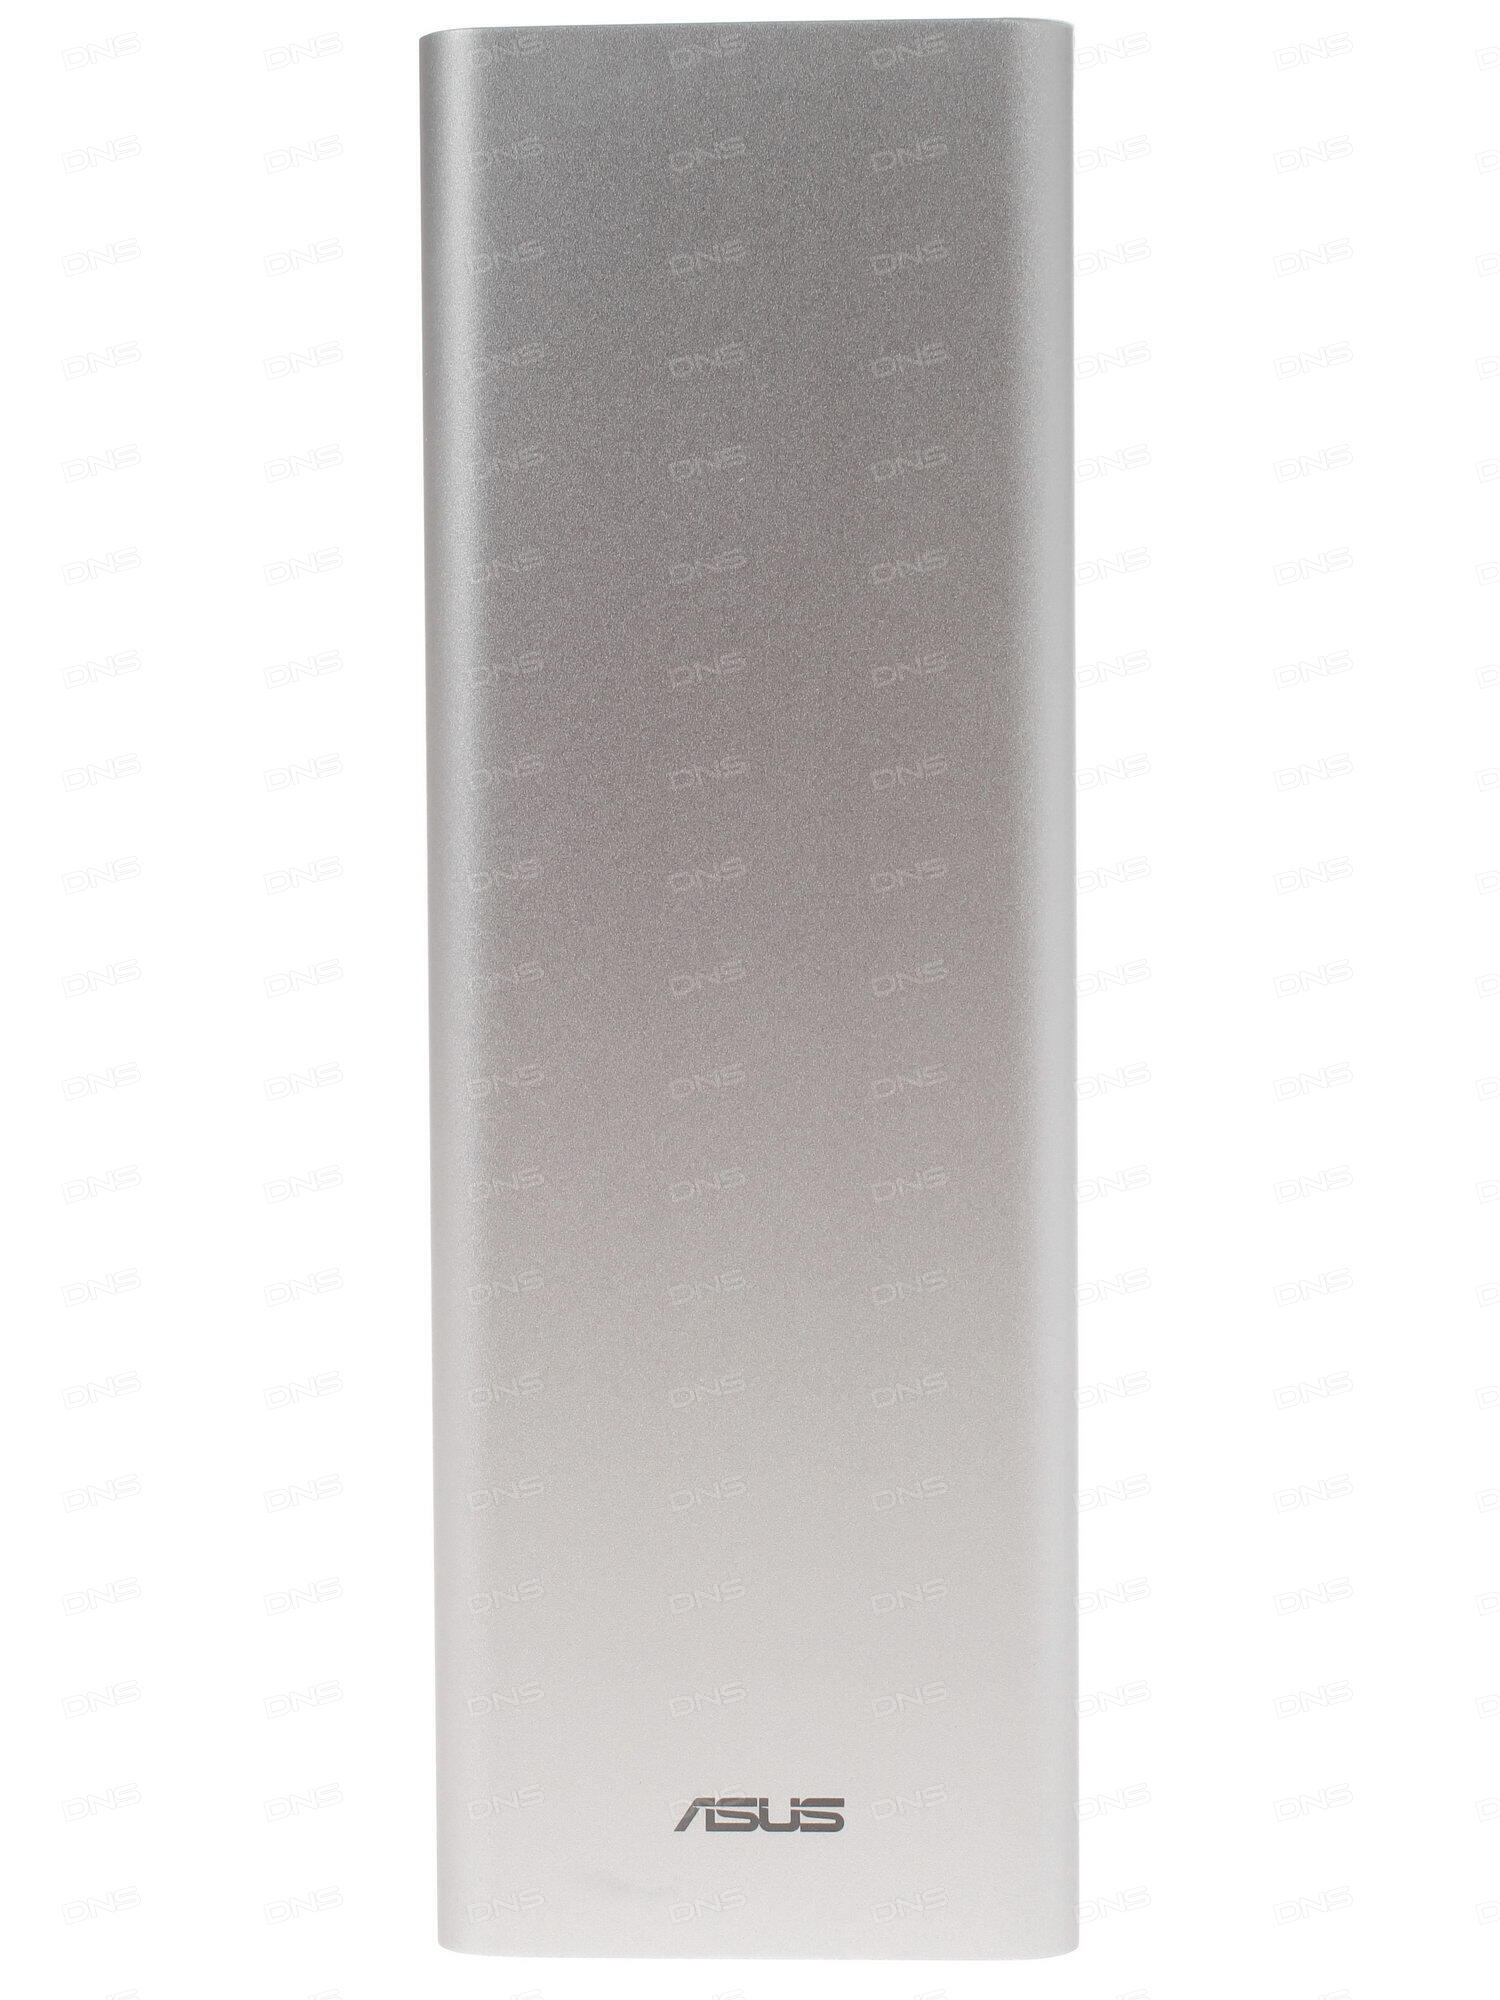 Аккумулятор ASUS ZenPower 10050mAh Silver 90AC00P0-BBT027 / 90AC00P0-BBT002